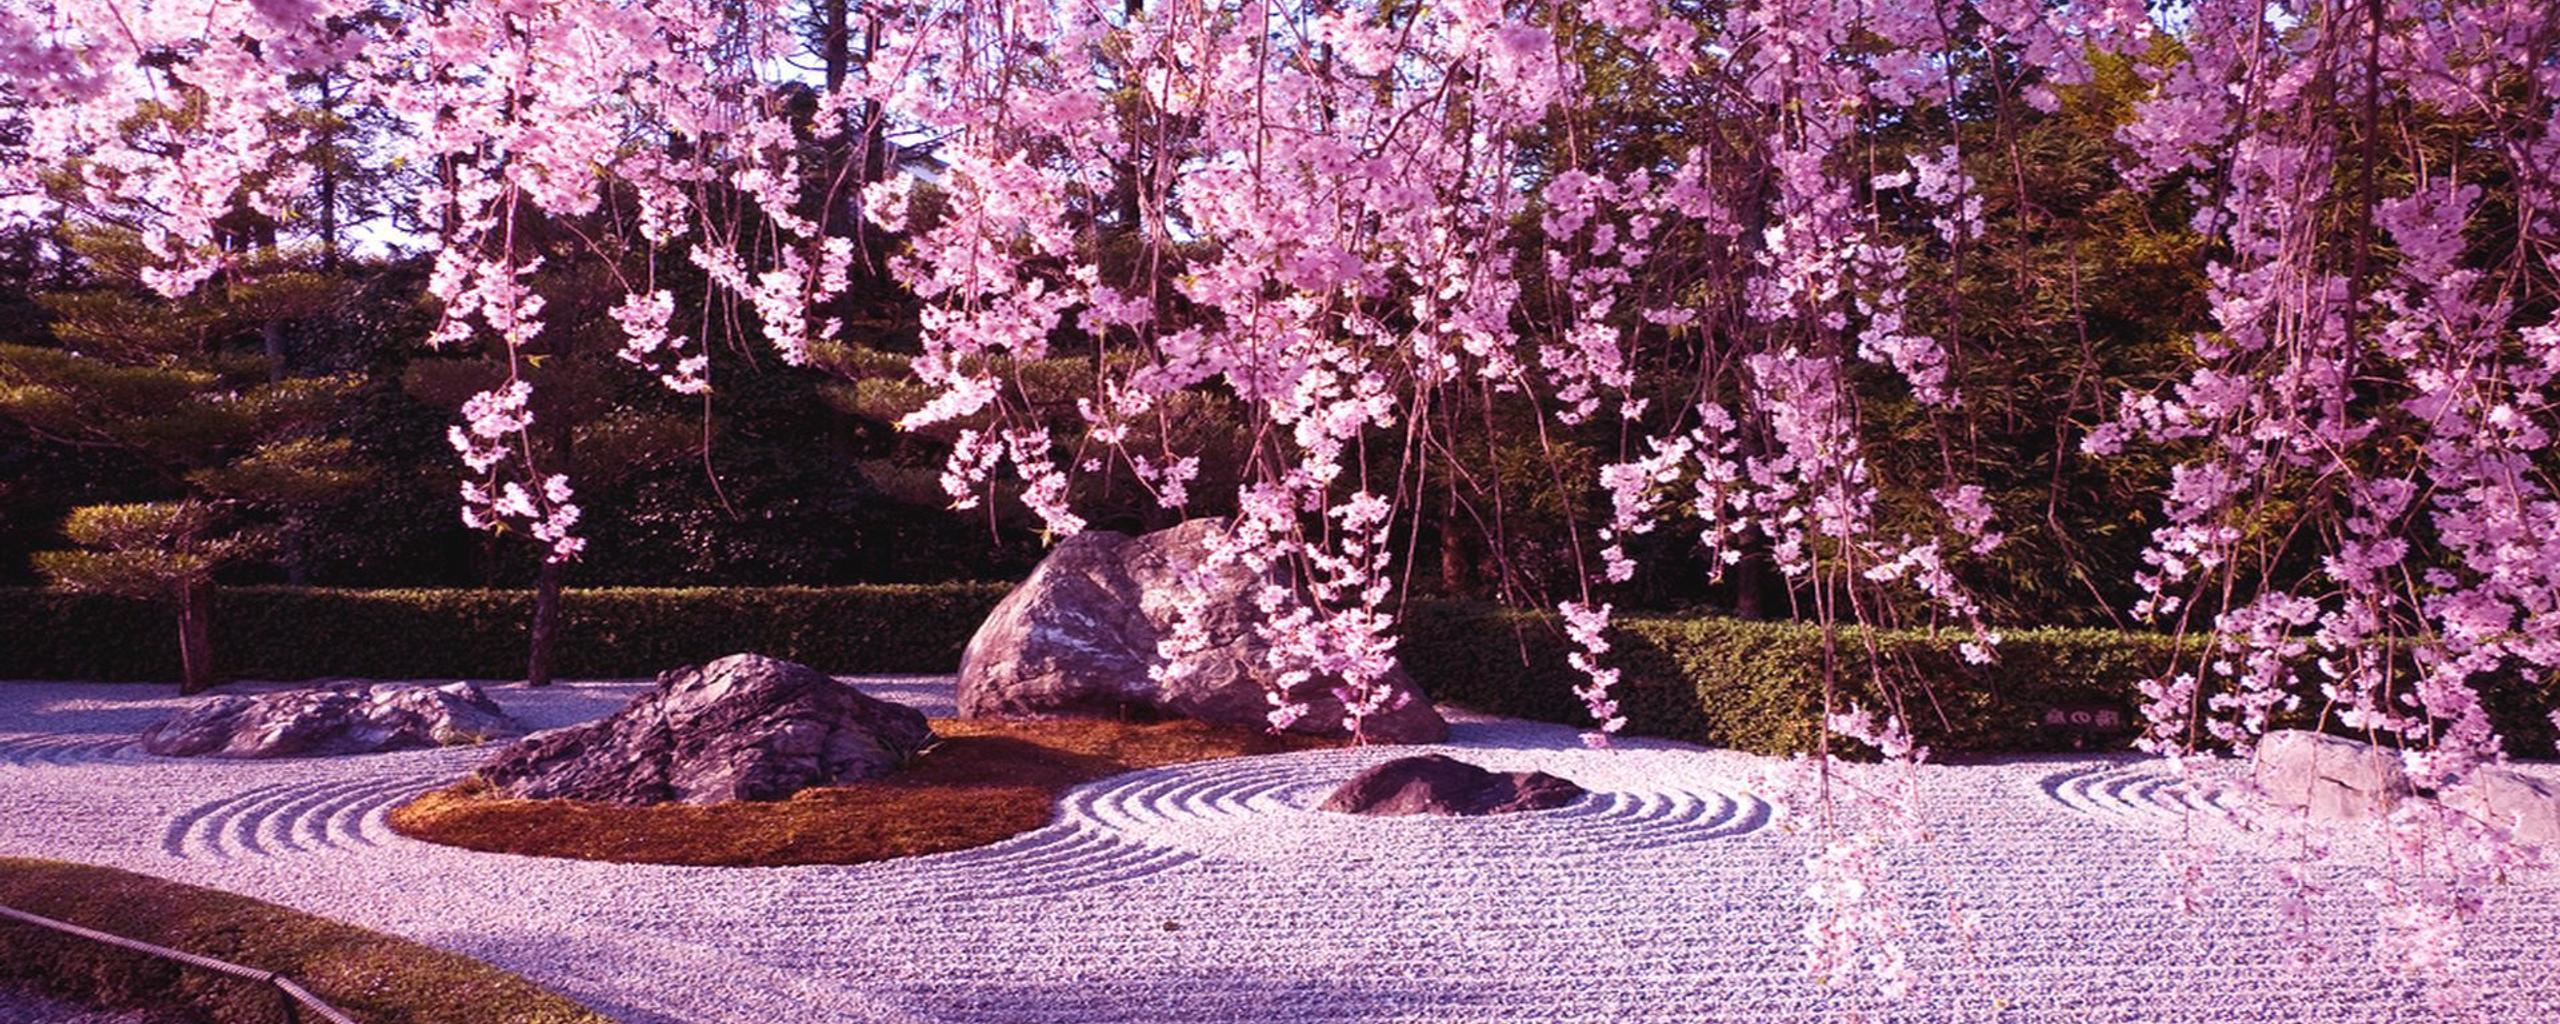 Cherry Tree Blossom Wonderful Carpet Of Spring Flowers Wallpaper